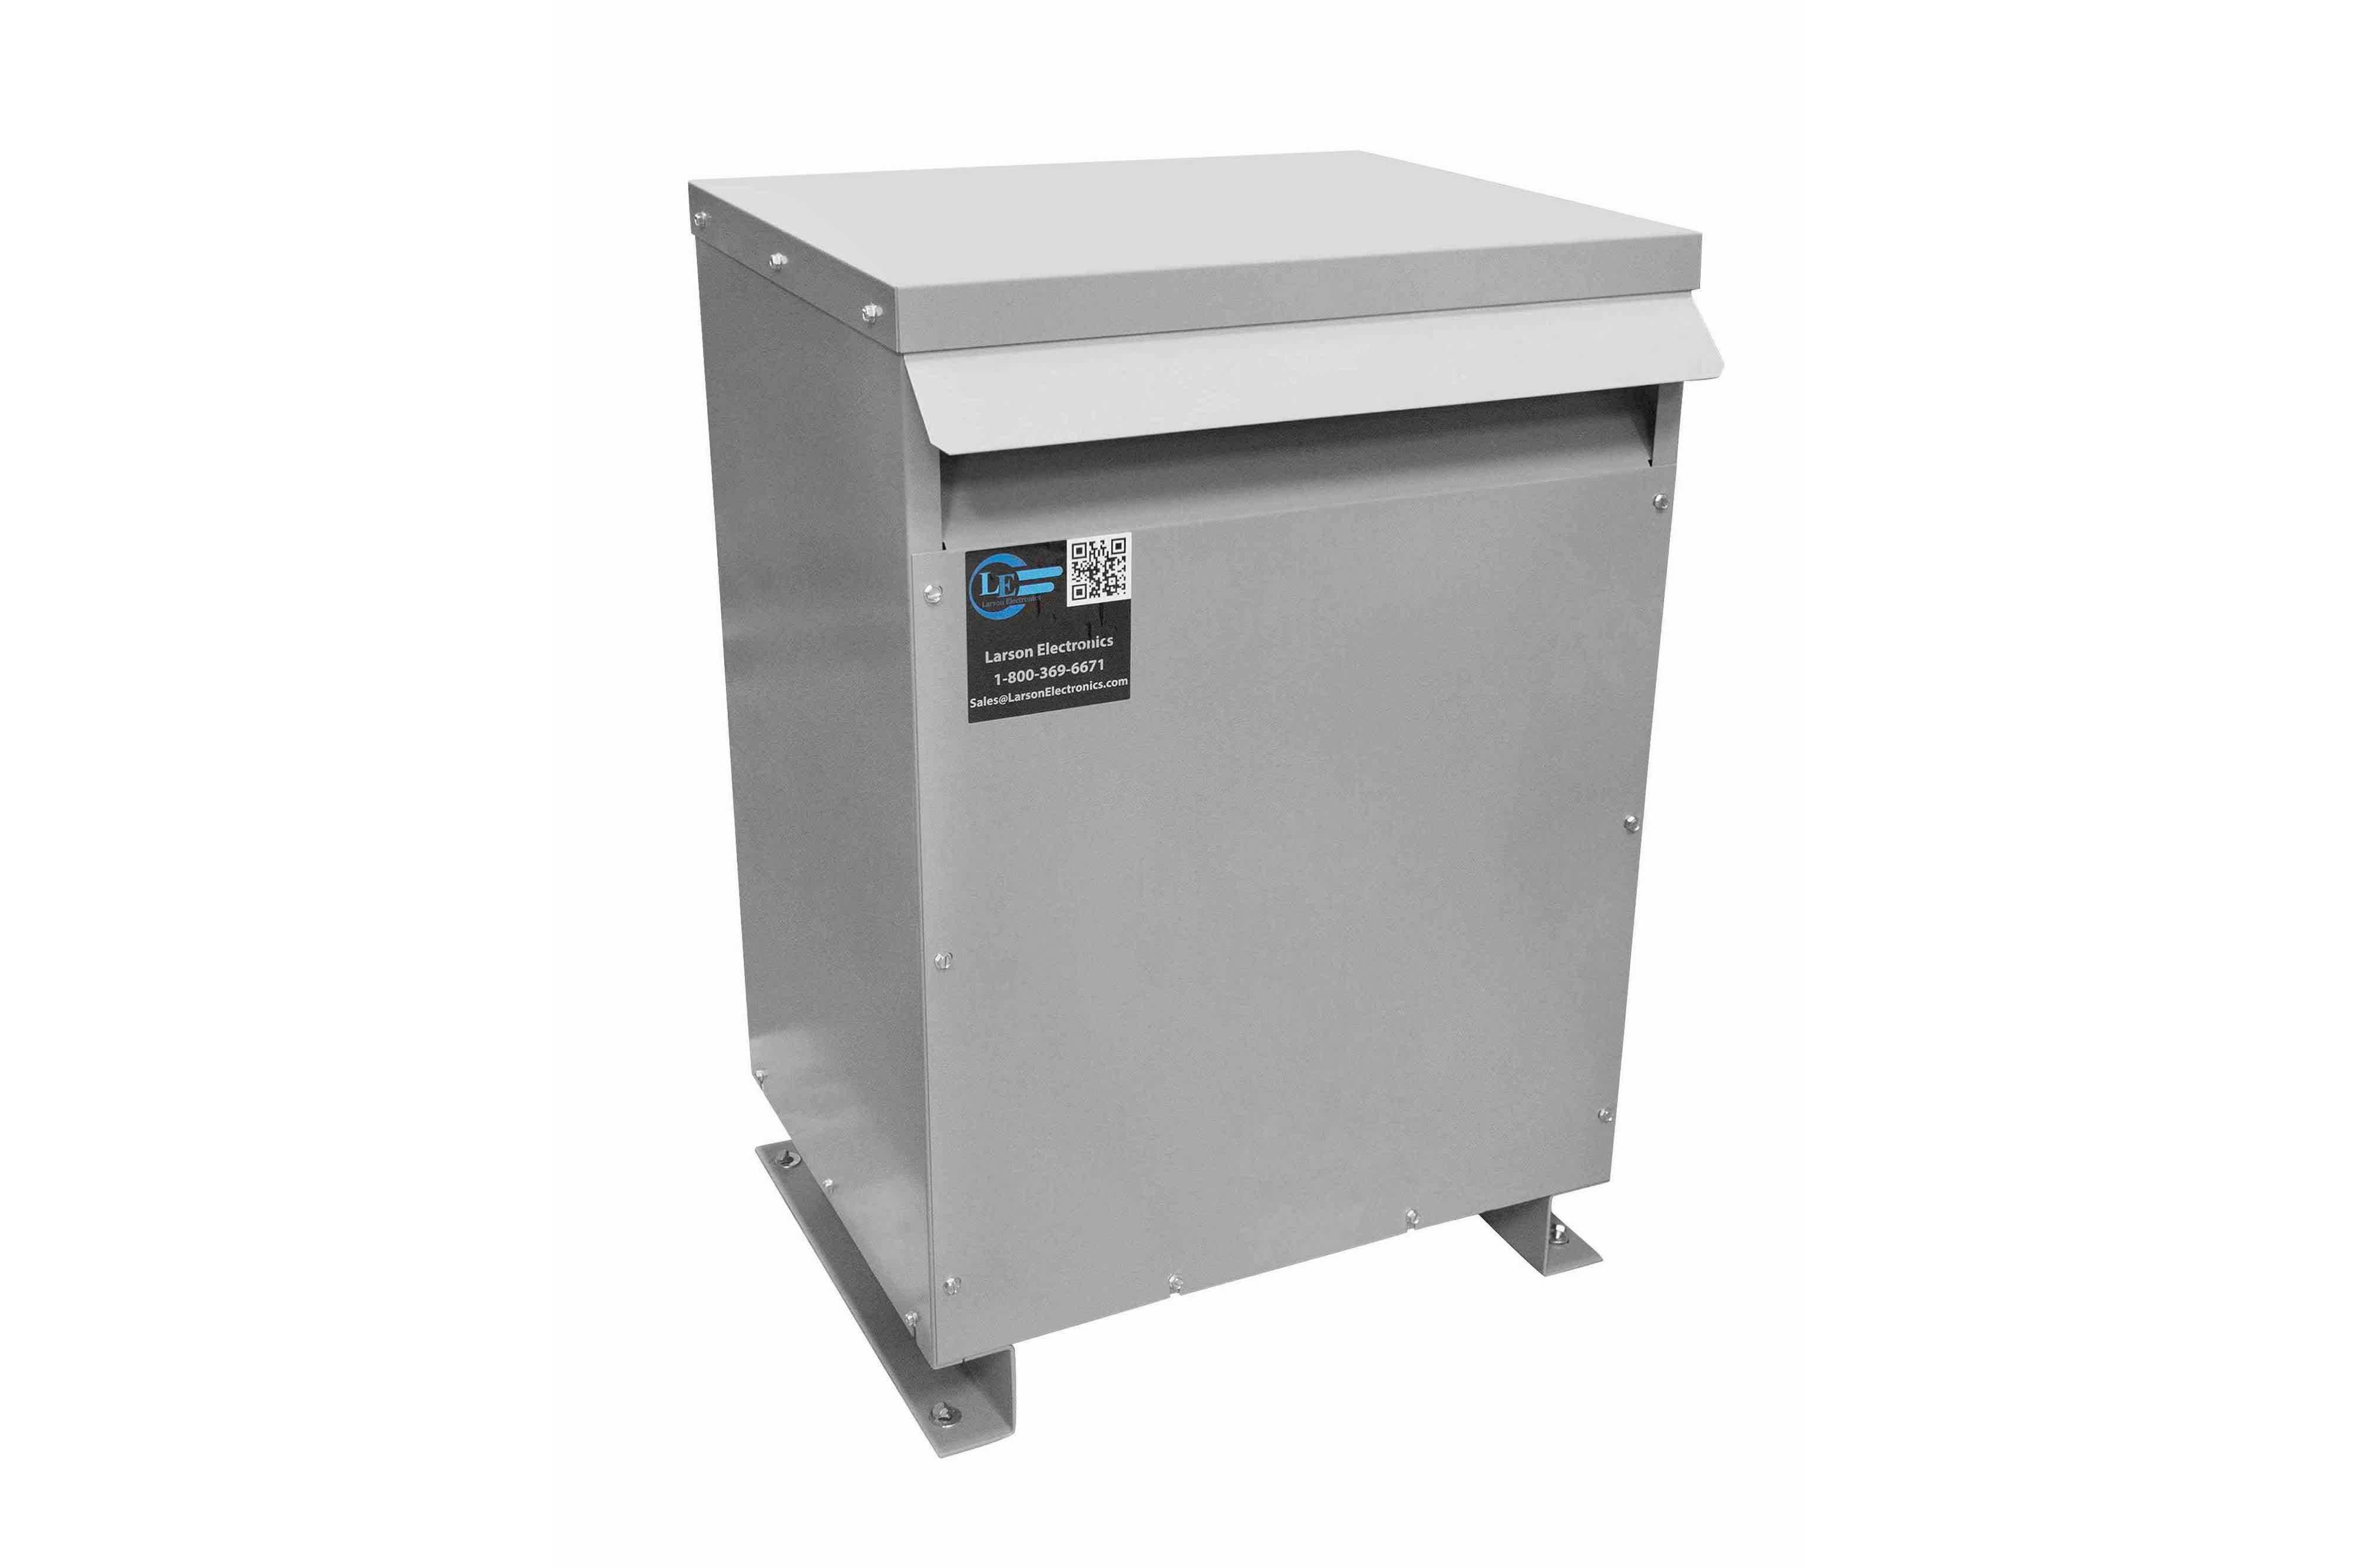 20 kVA 3PH Isolation Transformer, 575V Wye Primary, 400V Delta Secondary, N3R, Ventilated, 60 Hz